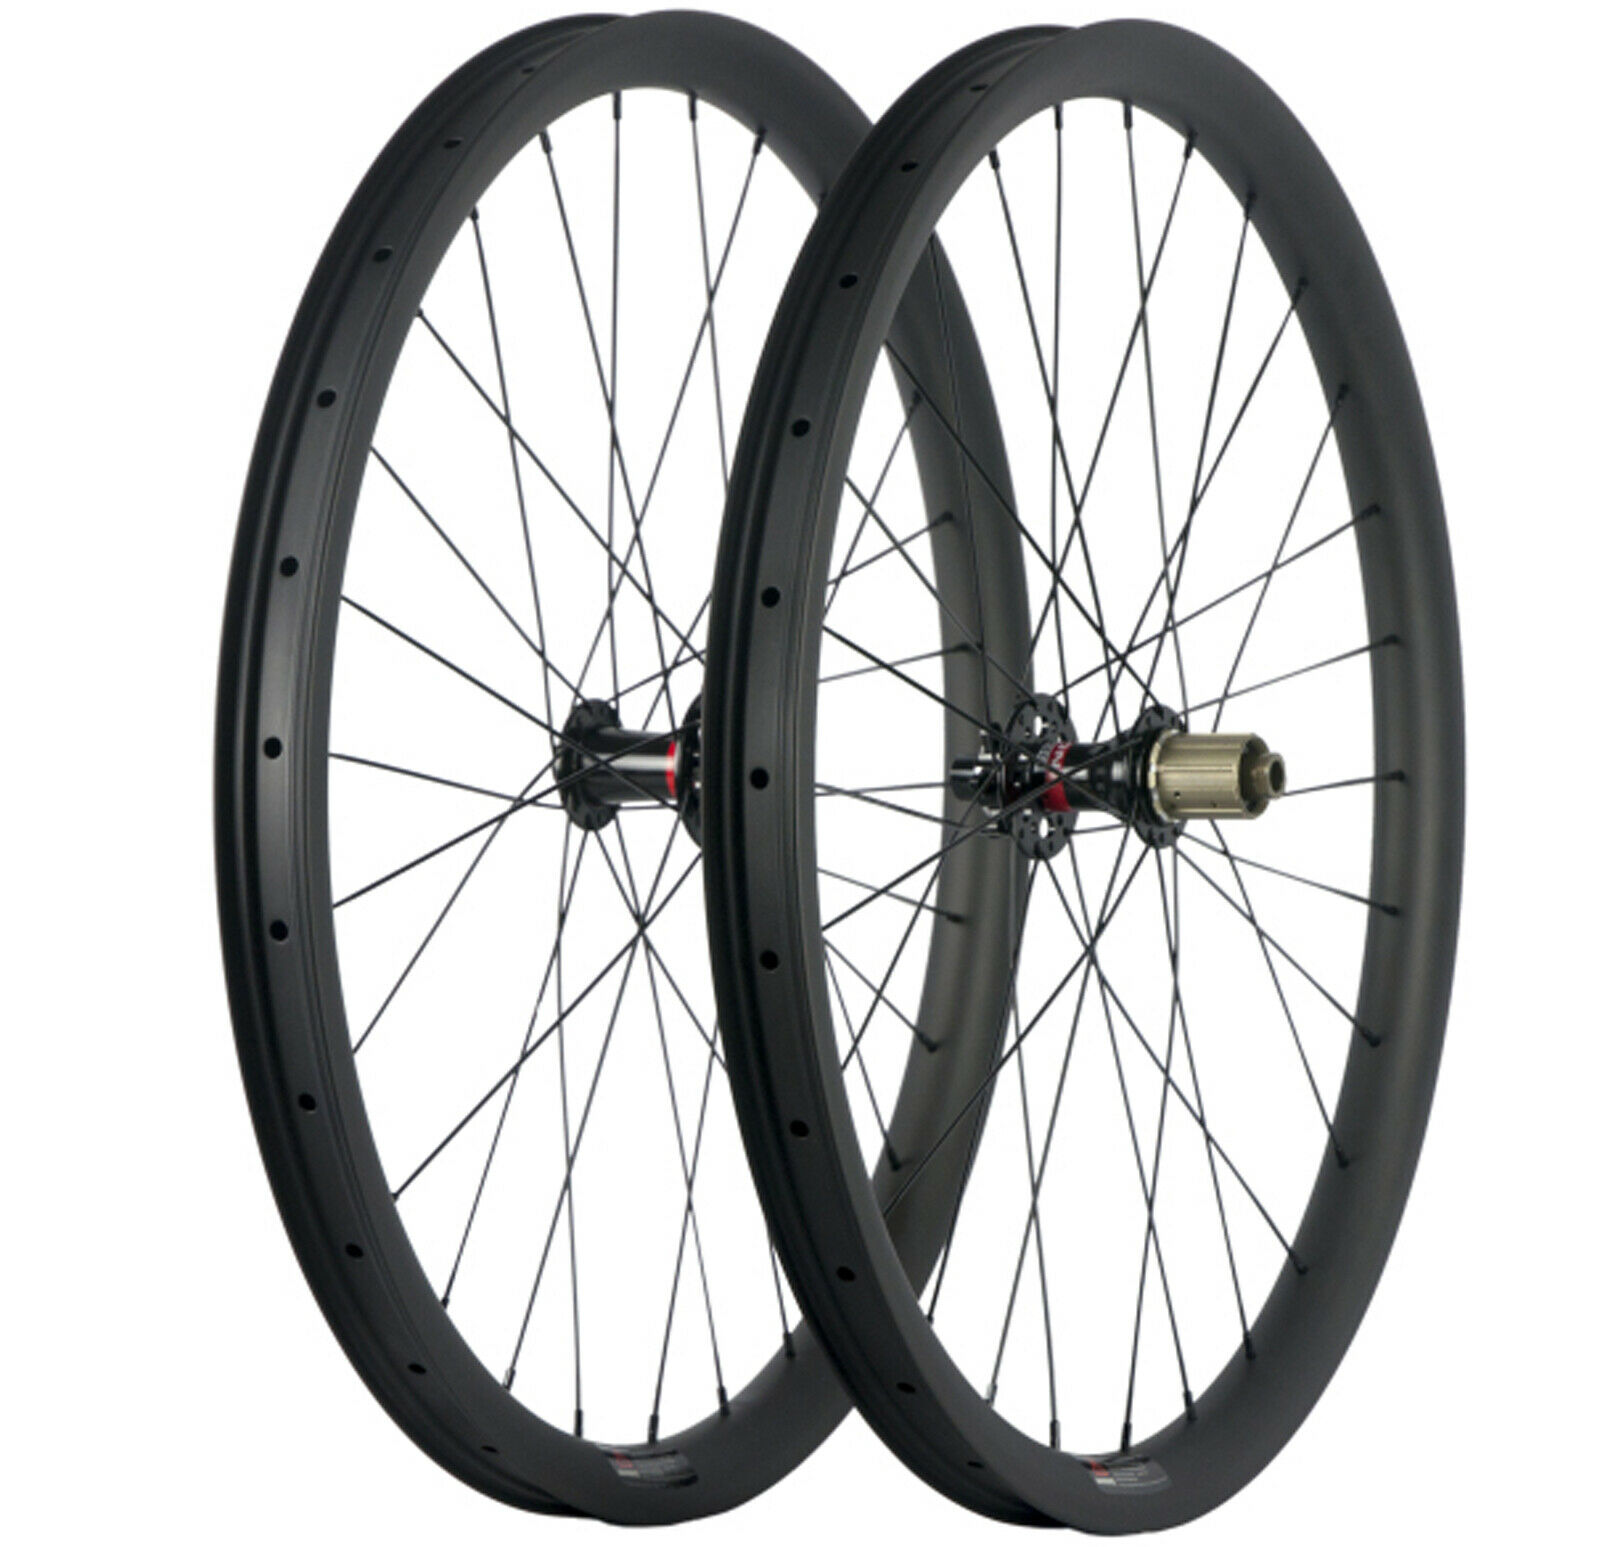 MTB Bike Carbon Wheels 27.5ER 35mm Width Tubeless Wheelset  AM Mountain Bicycle  zero profit